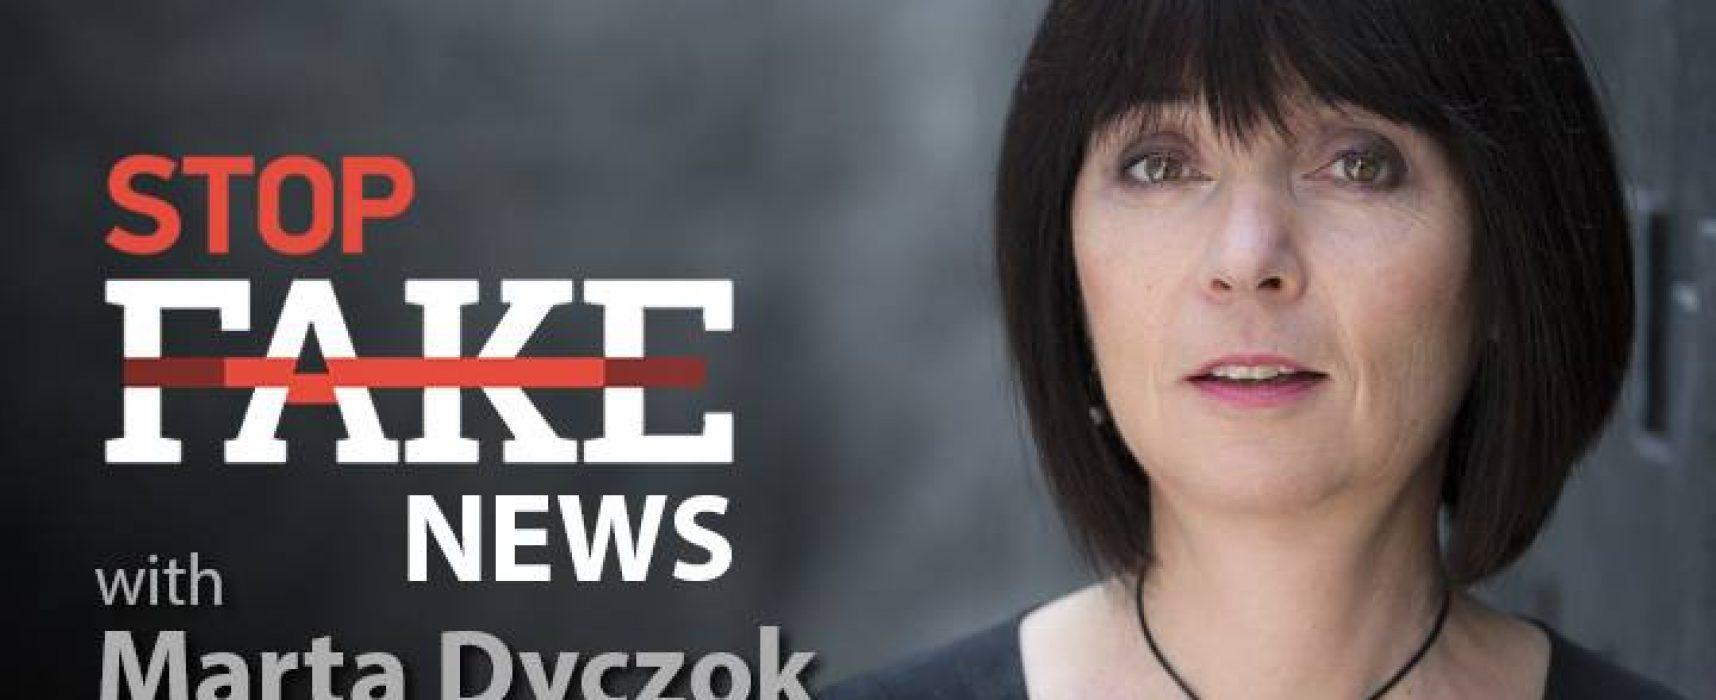 StopFakeNews #91 [Engels] met Marta Dyczok